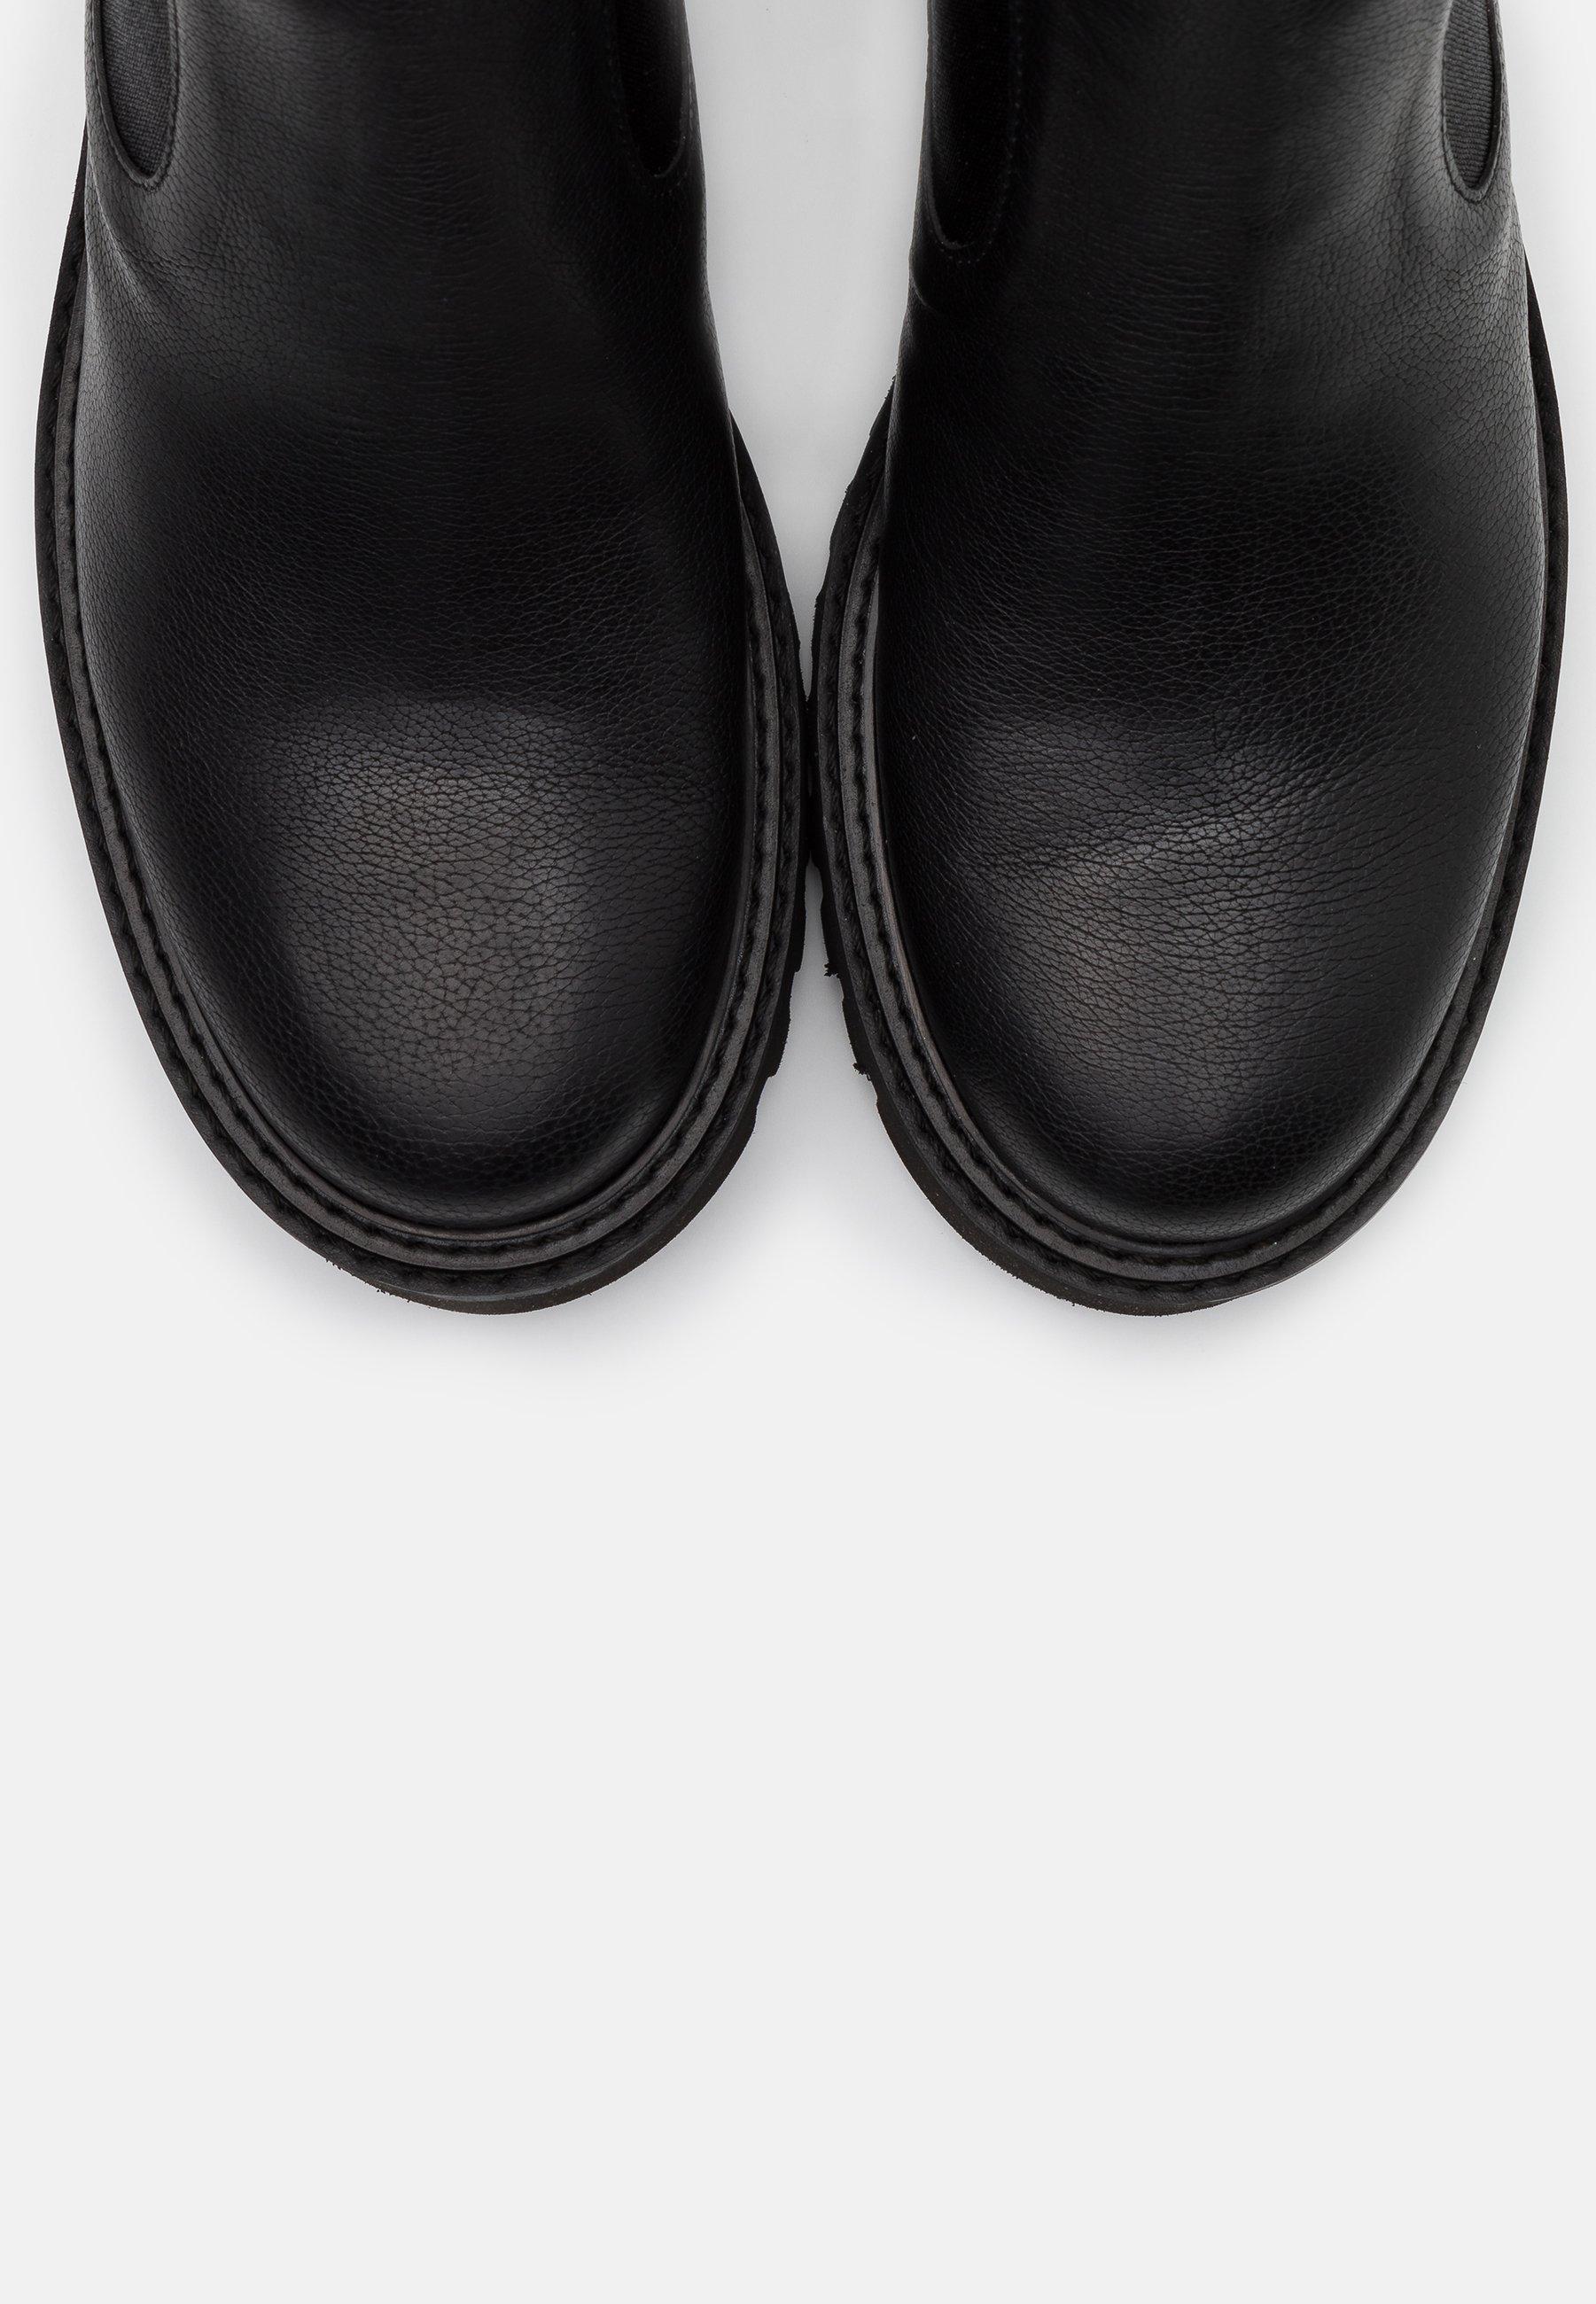 Homers ROW Plateaustiefelette black/schwarz